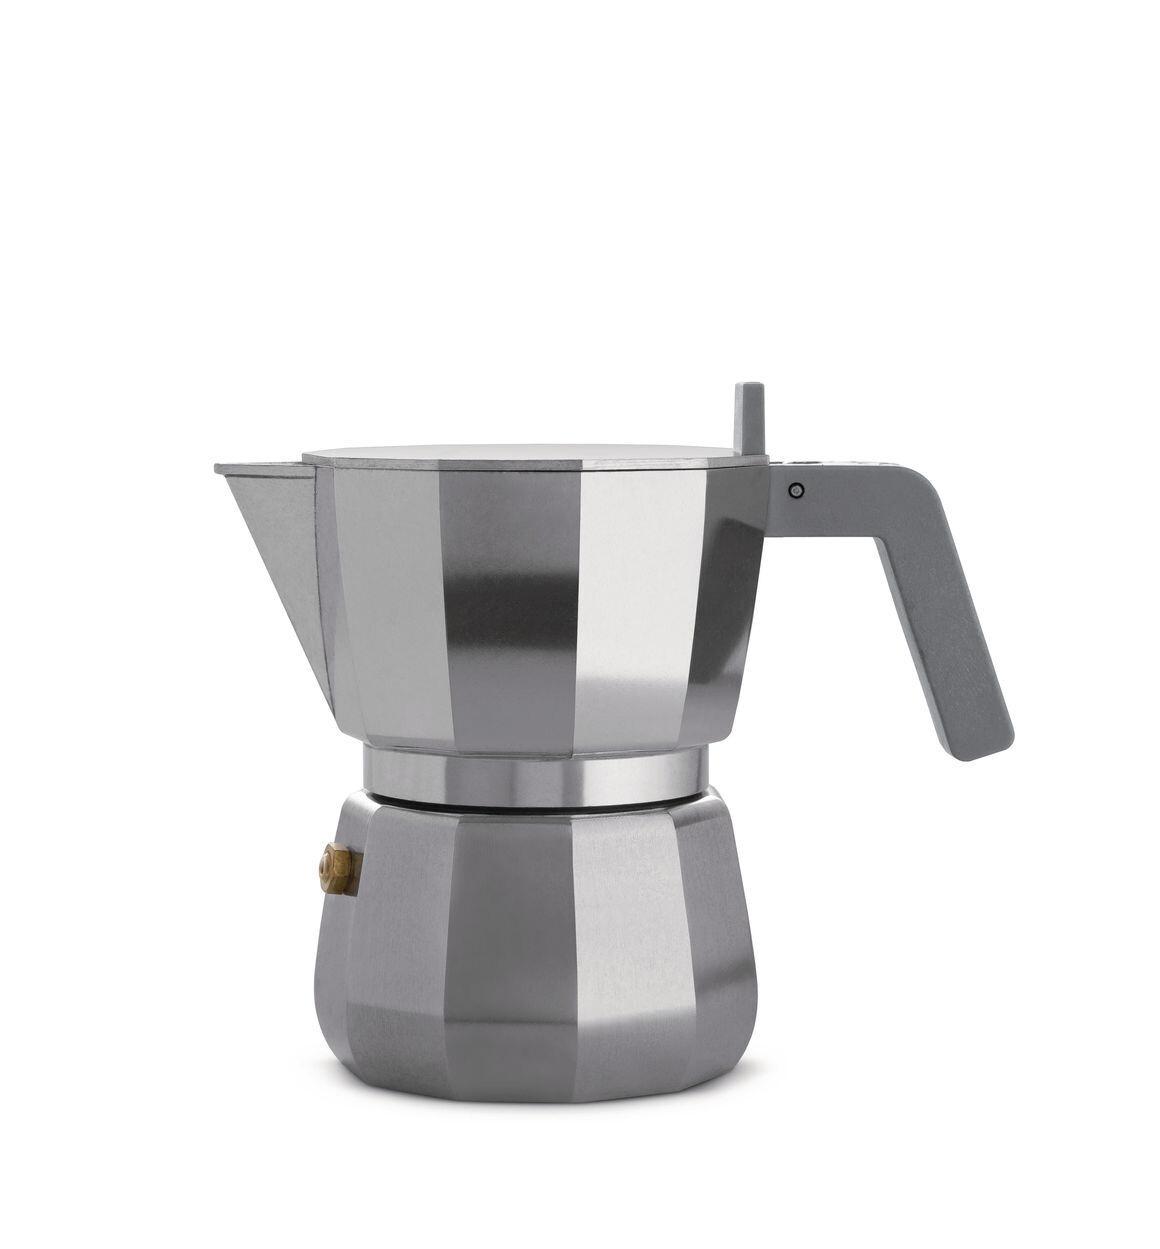 ALESSI 'moka' espresso koffiemaker 3 cups